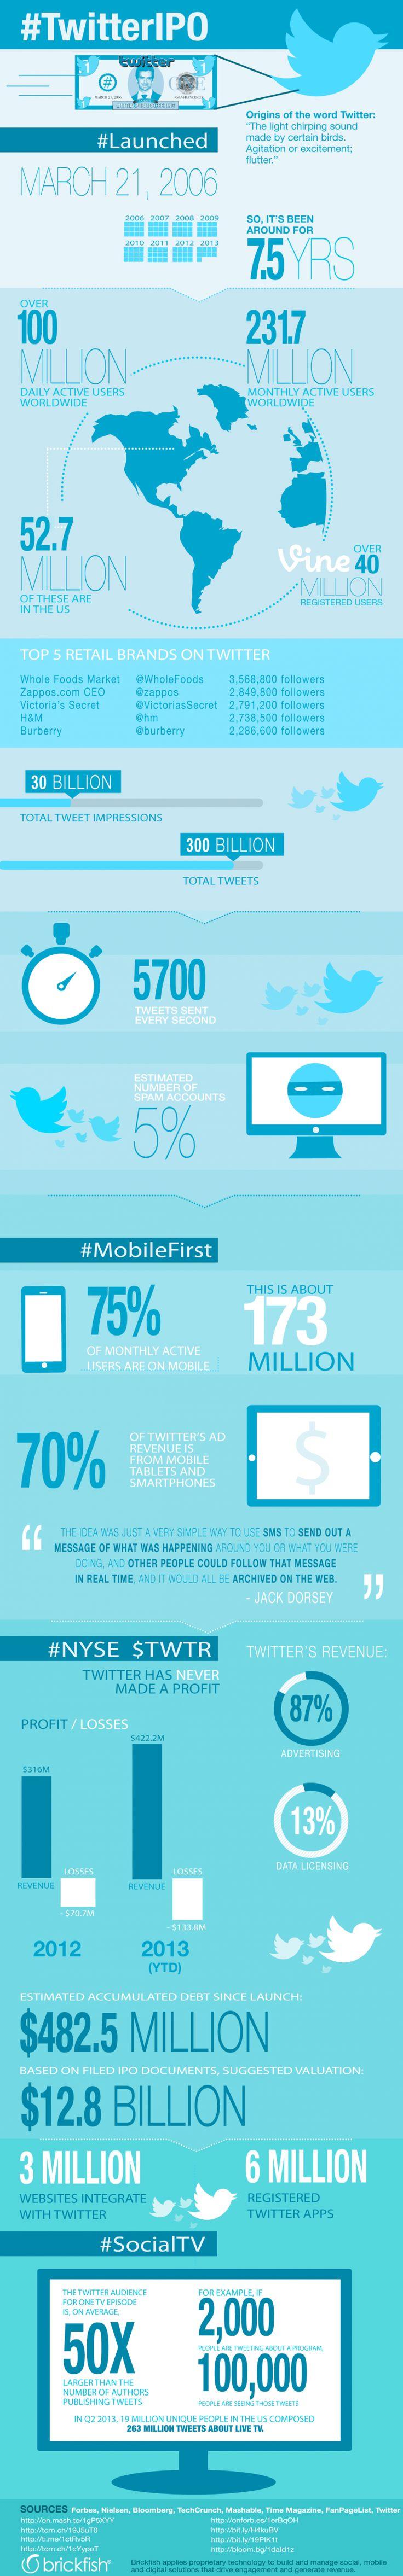 Amazing Twitter Statistics [INFOGRAPHIC]Website, Web Site, Social Media, Twitter Statistics, Statistics Infographic, Twitter Ipo, Socialmedia, Amazing Twitter, Infographic Parks